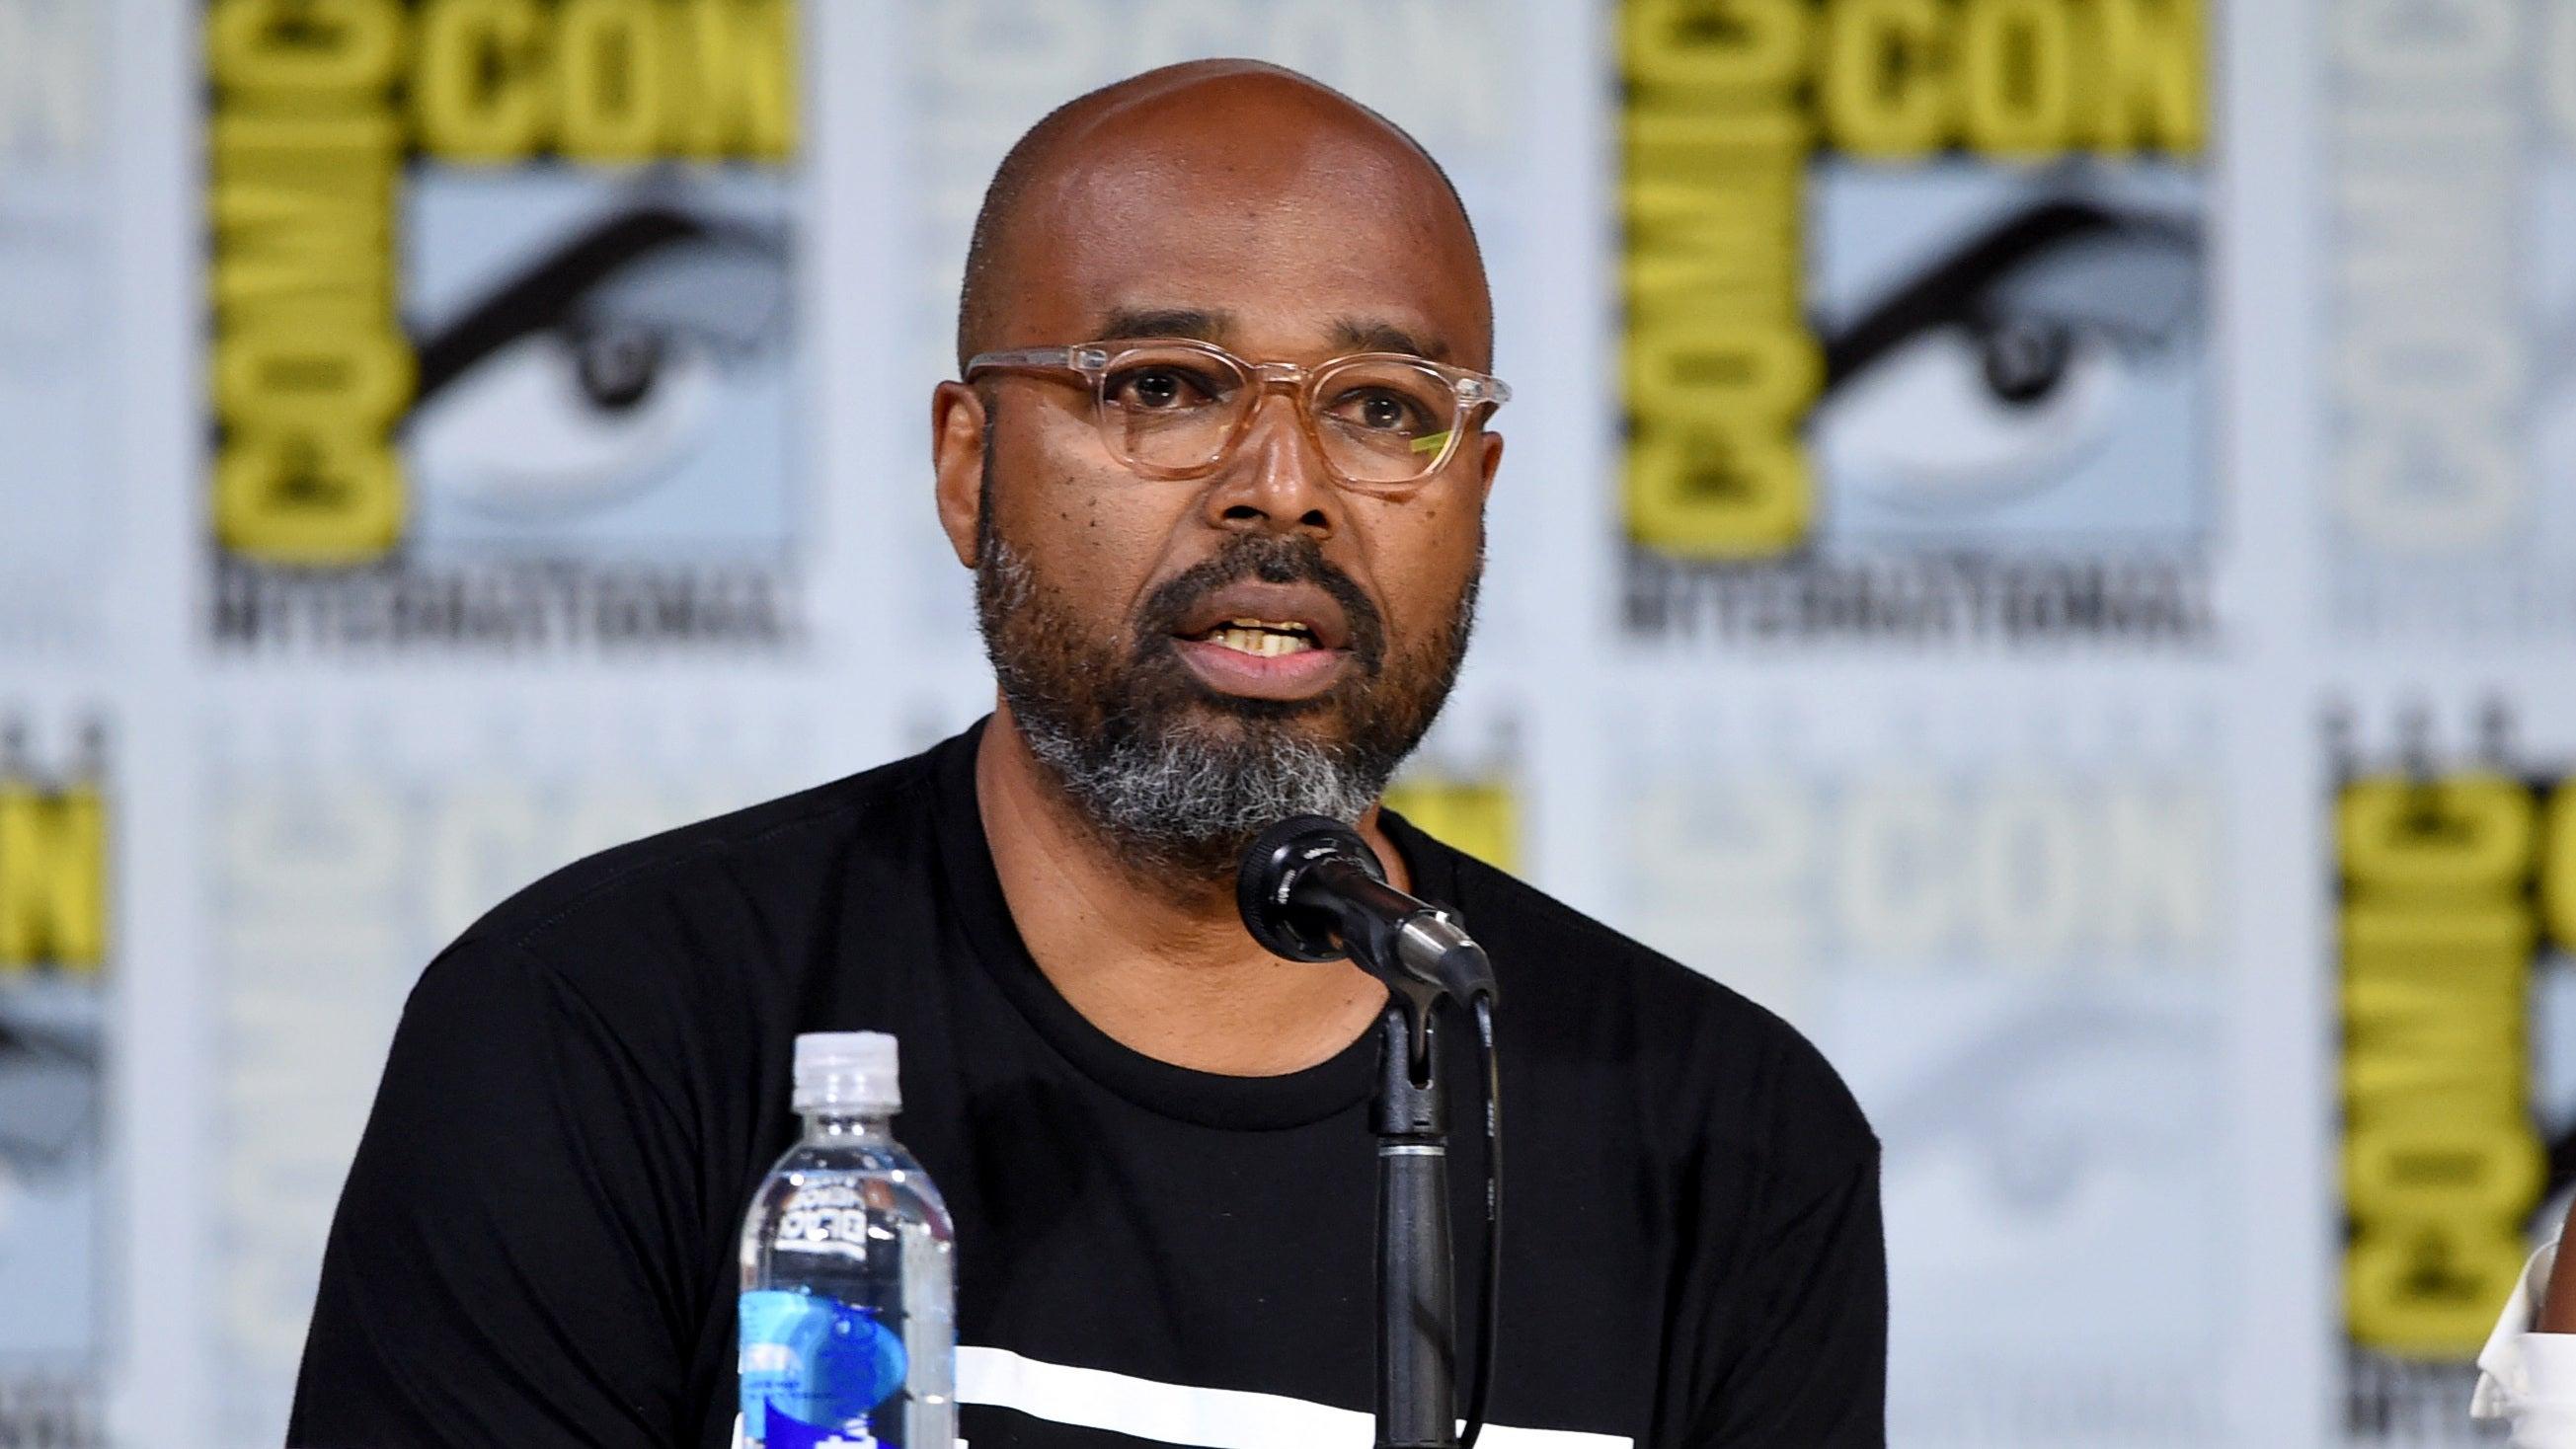 Warner Bros. Is Looking Into Black Lightning Showrunner Salim Akil Amid Allegations Of Abuse